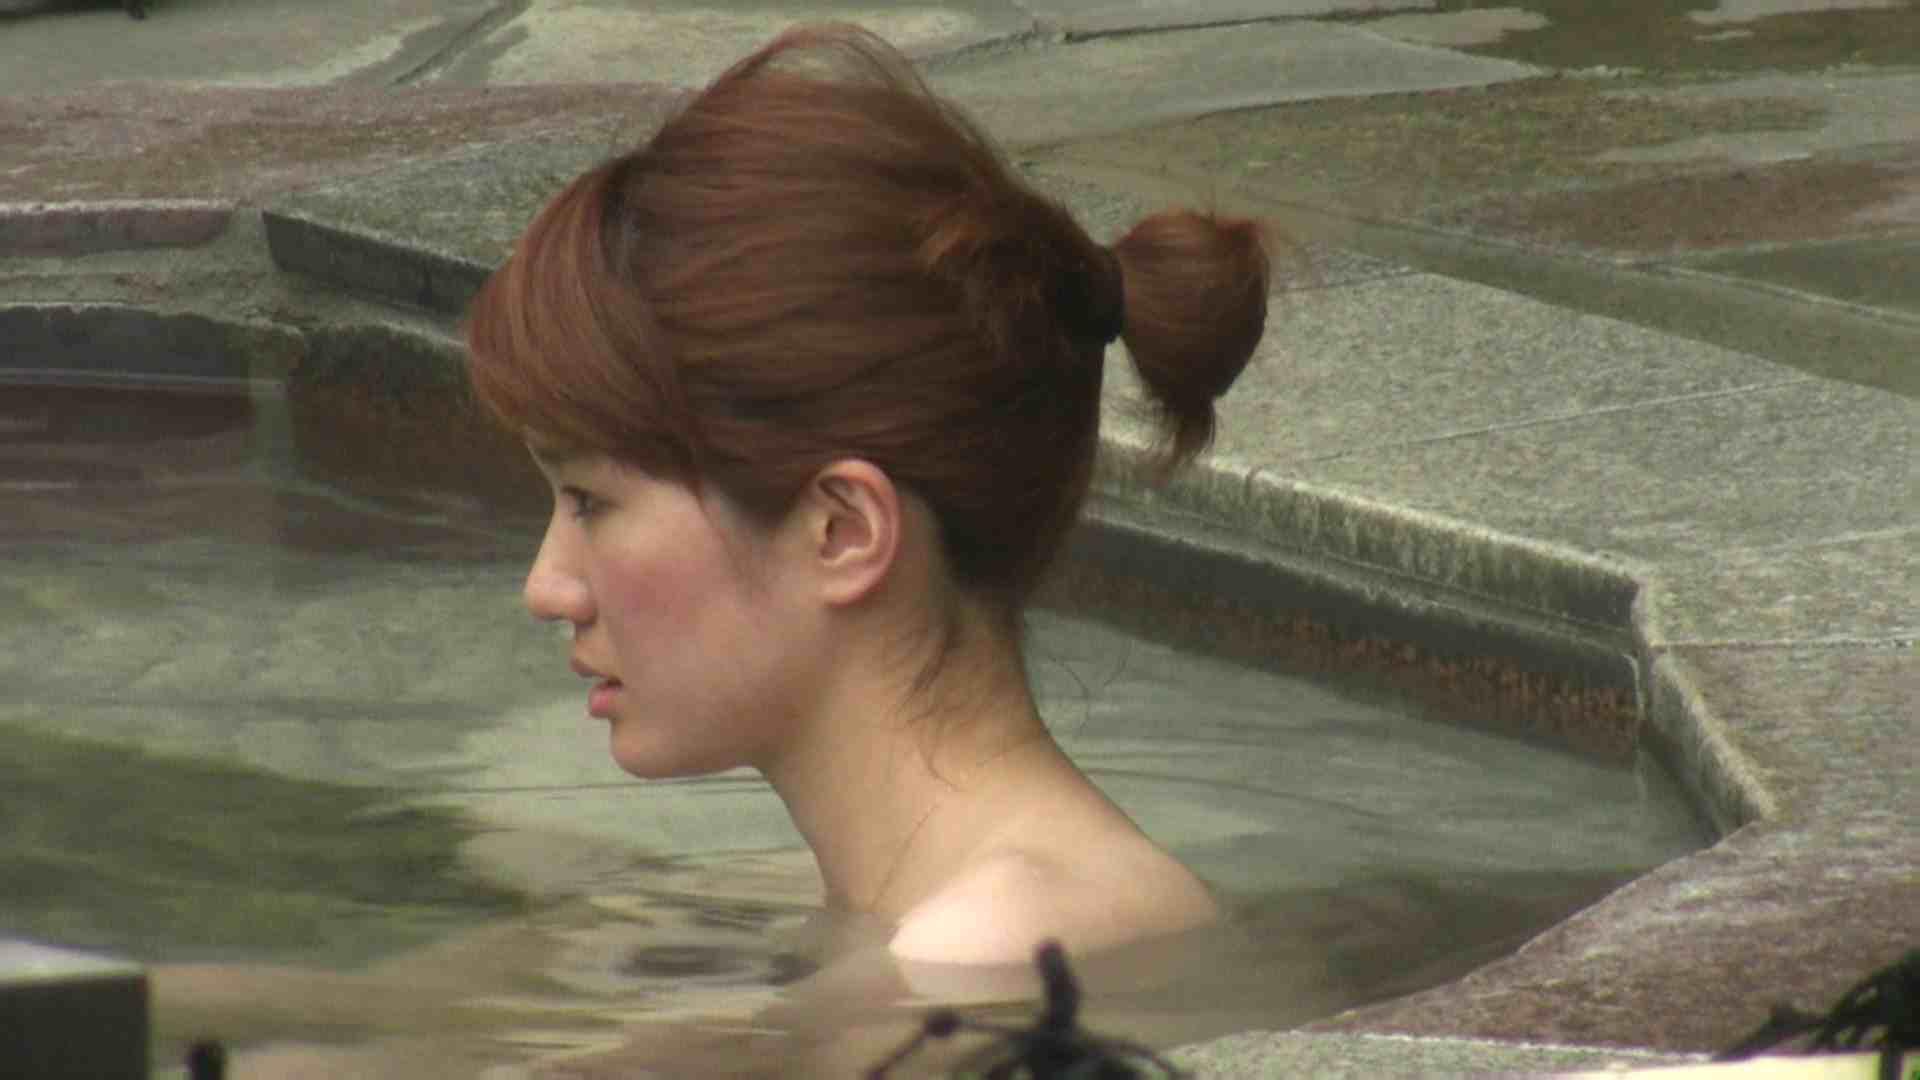 Aquaな露天風呂Vol.110 HなOL | 盗撮  71pic 27